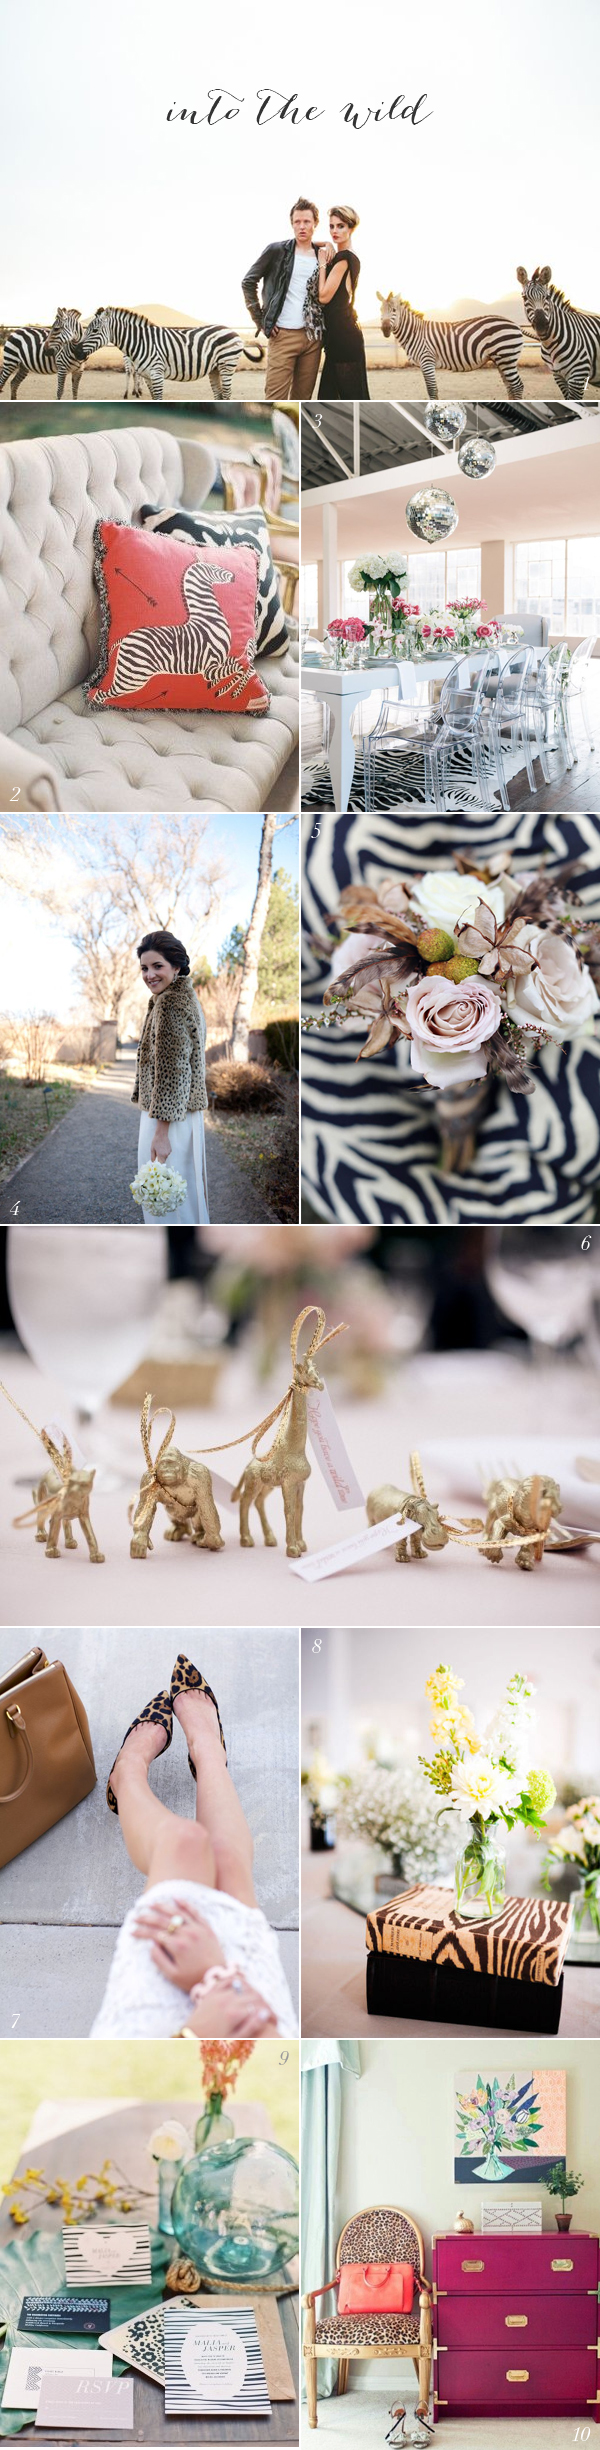 Safari Wedding Ideas